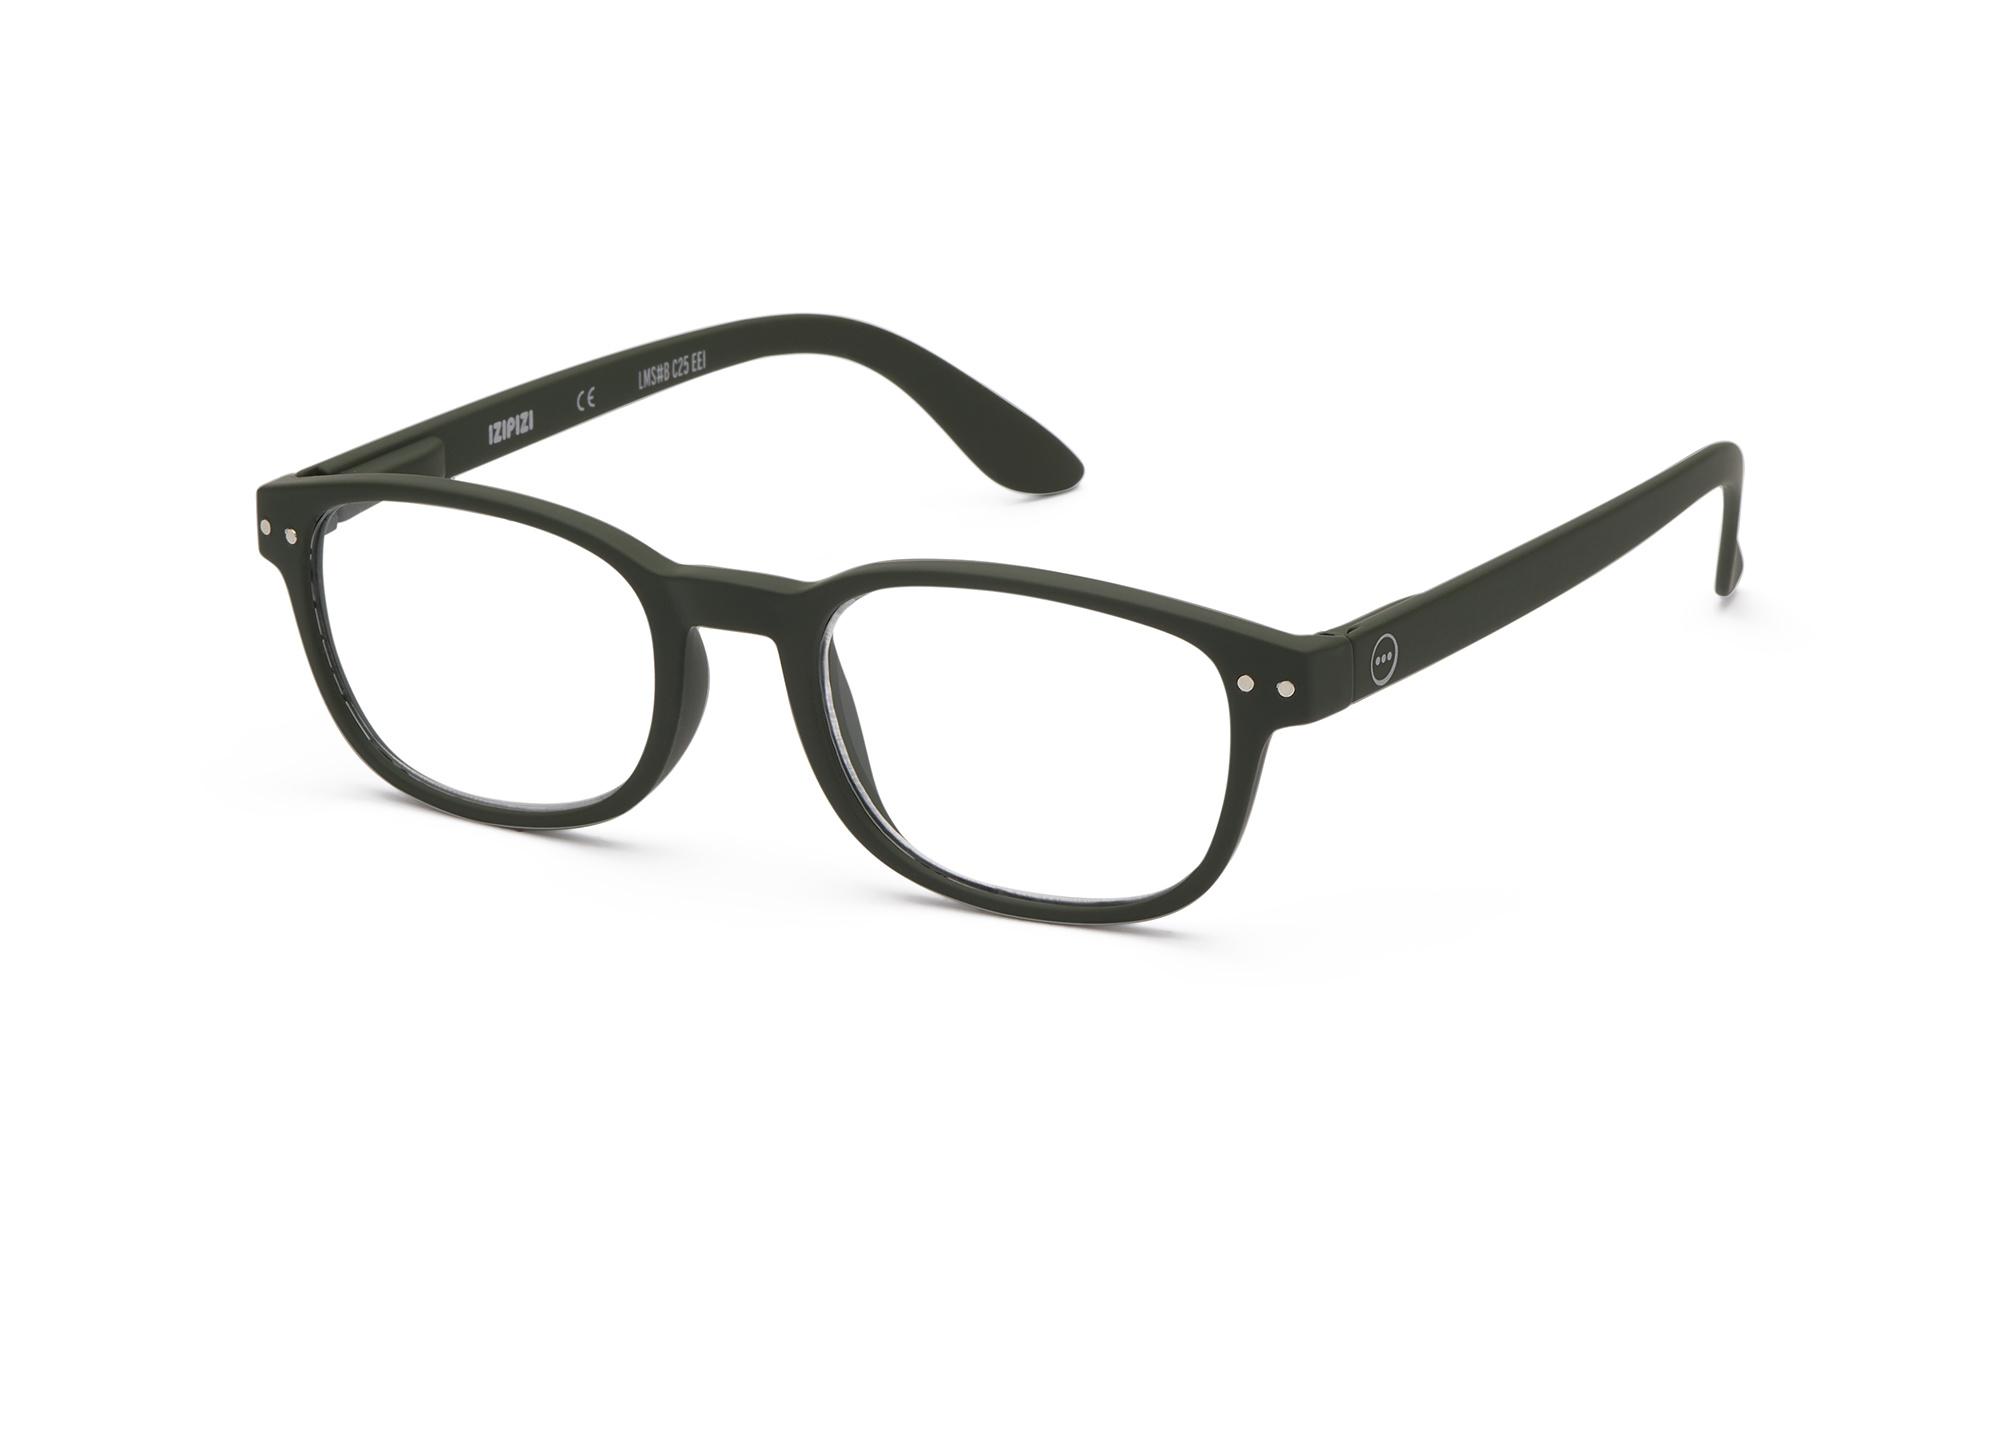 Izipizi leesbril model B Kaki Green-3